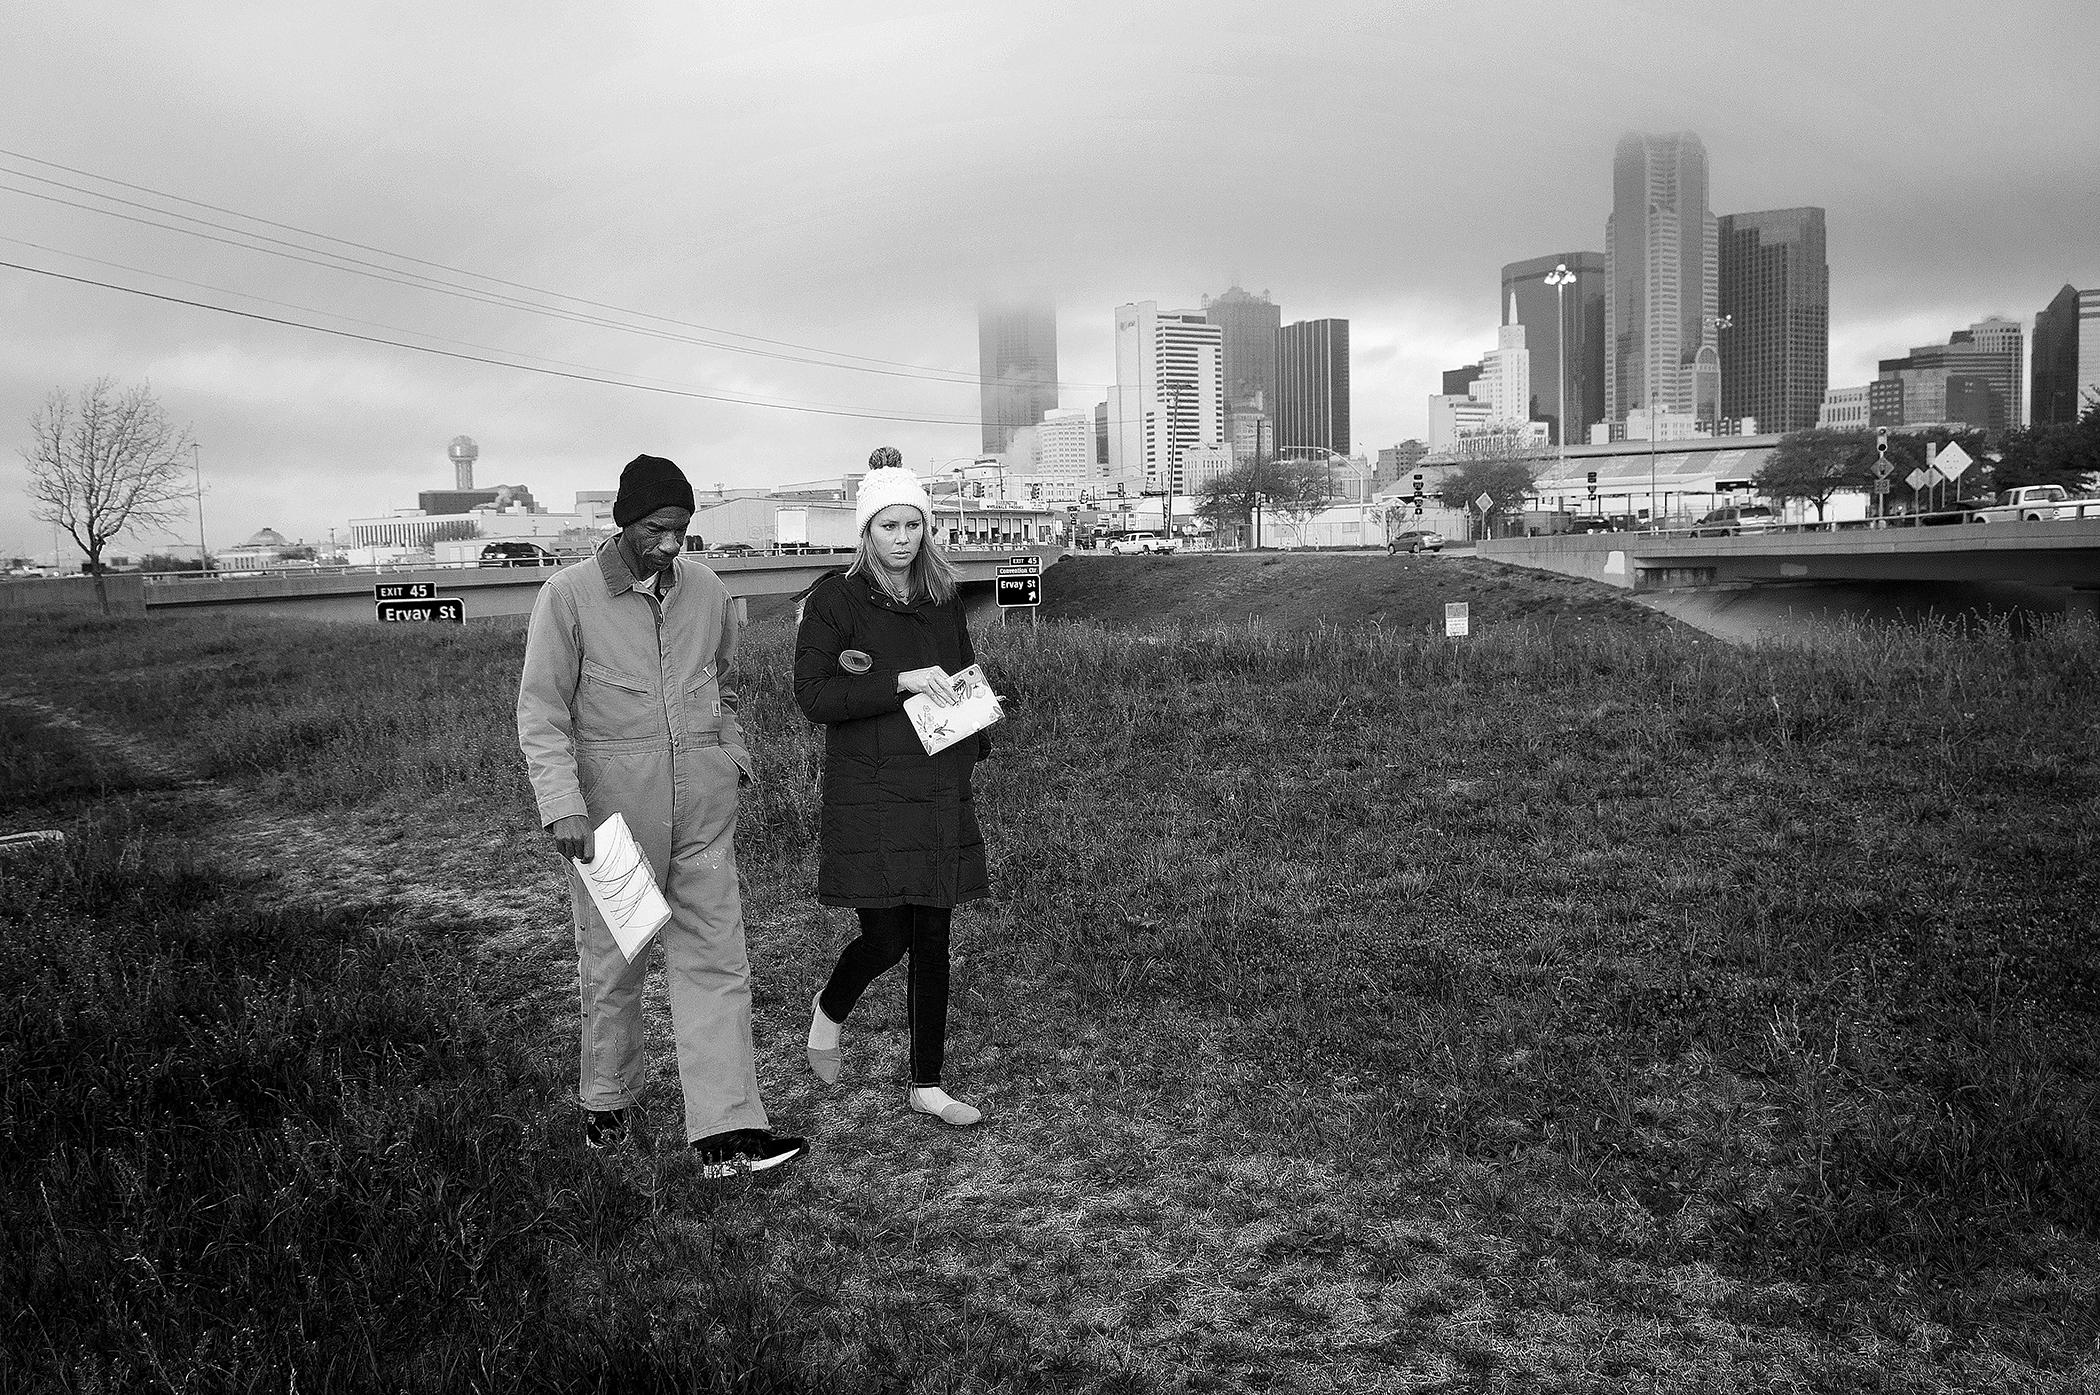 Photo by Christena Dowsett Crawford, left, and The Human Impact staff, Elisabeth Jordan, walk near downtown Dallas.